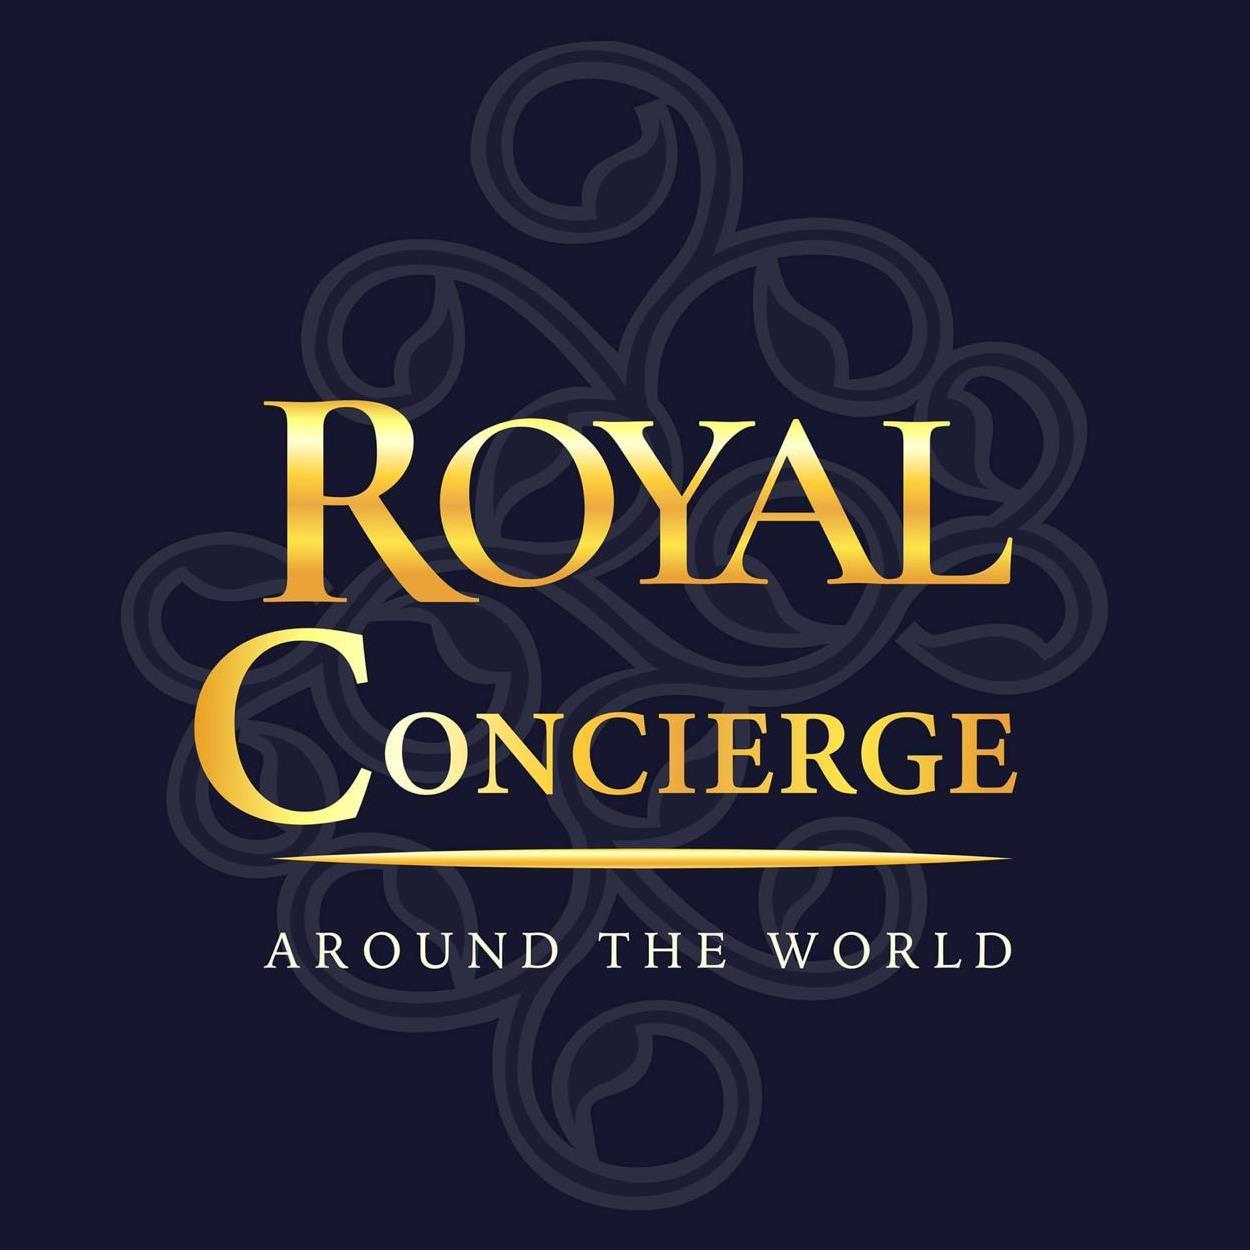 Royal Conicerge